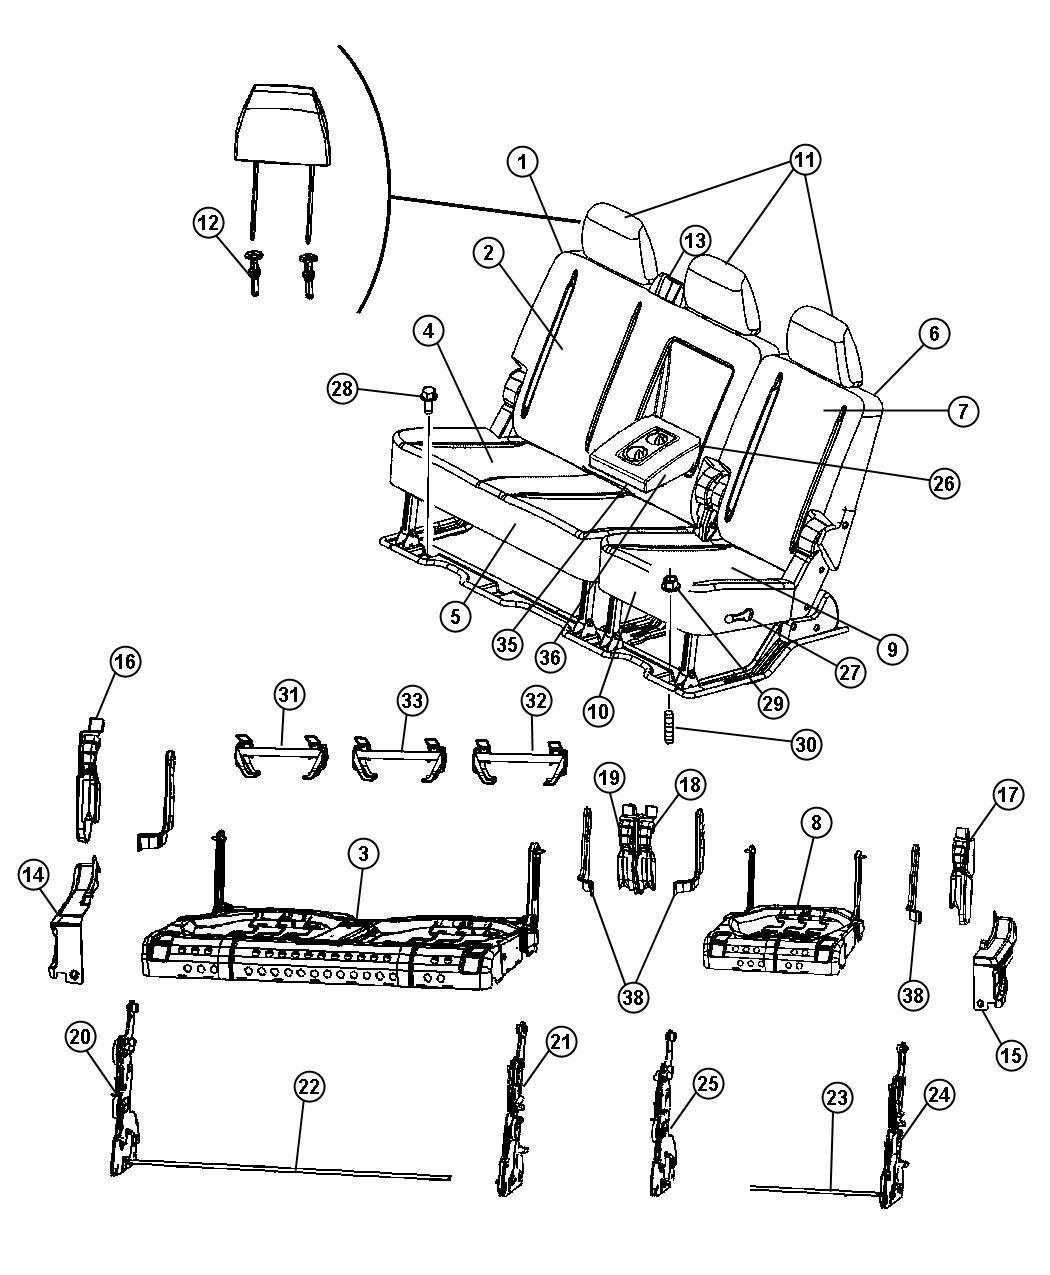 RAM 3500 Headrest. Rear. Center. [dk slate gray/russet